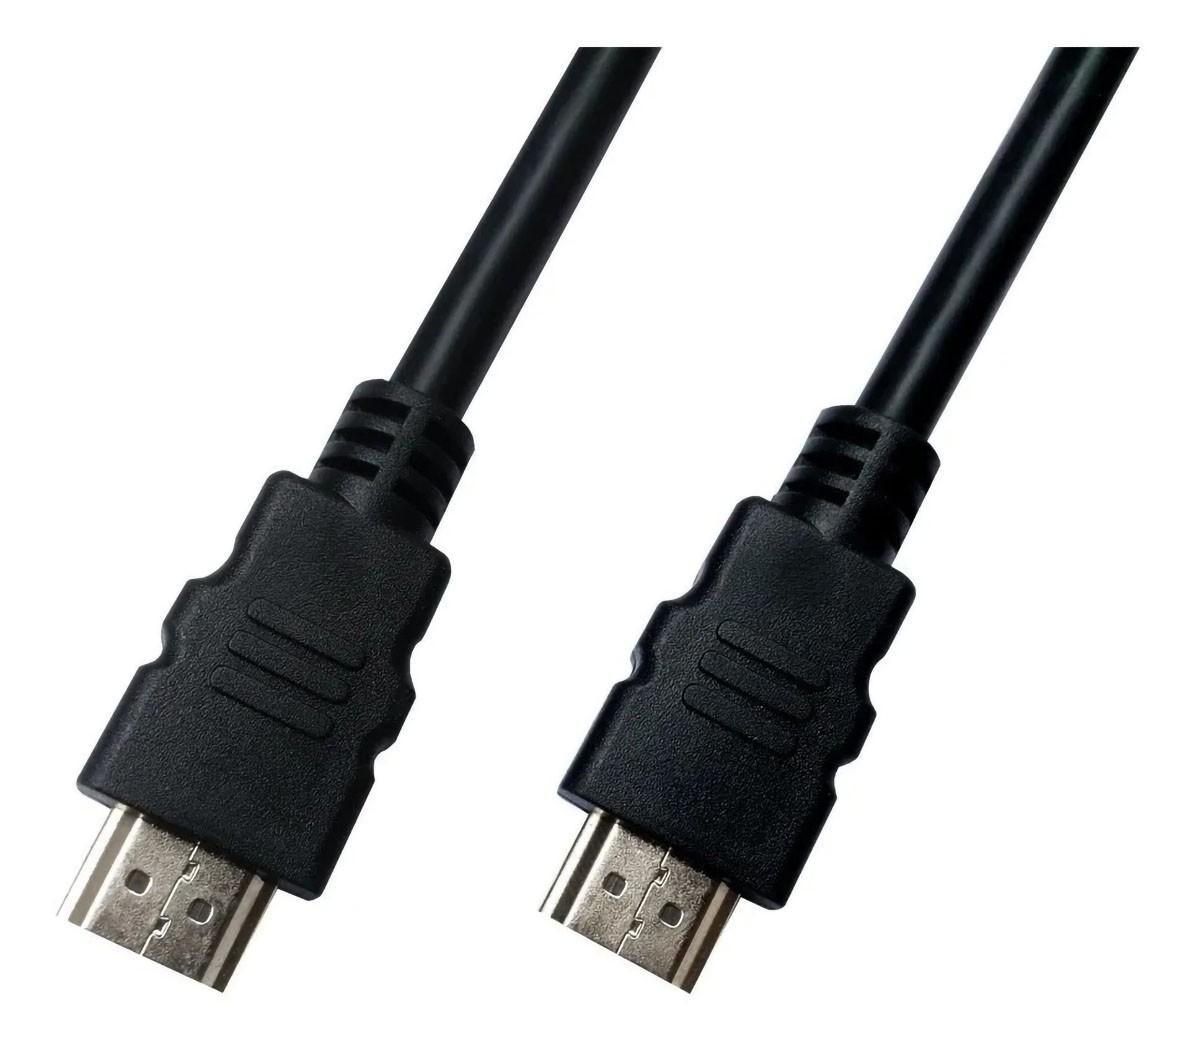 Cabo HDMI 5 Metros Proeletronic CAHD-2050